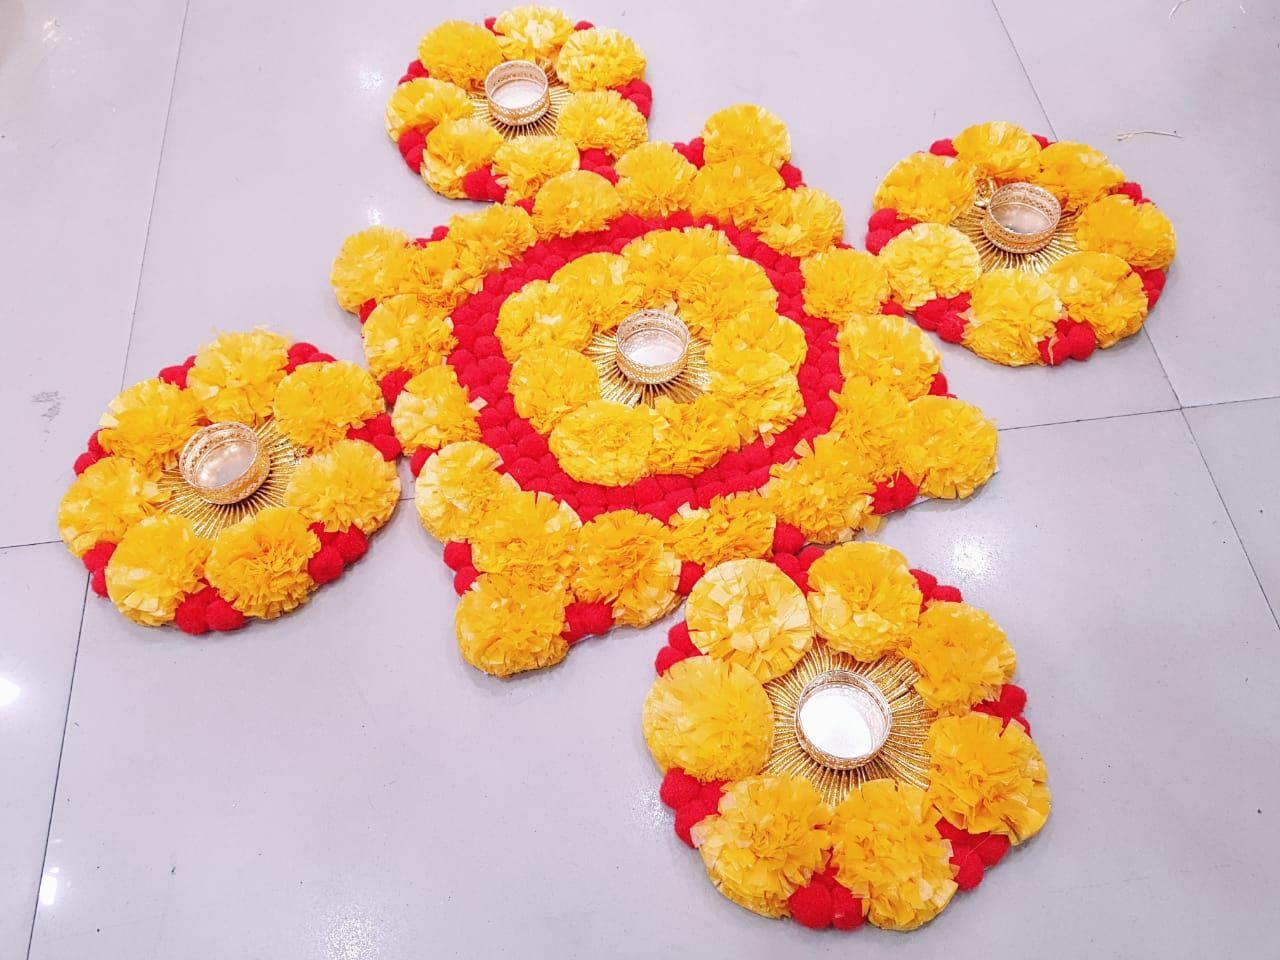 Marigold Flowers T Lights Rangoli Set For Floor Rangoli Decoration Instant Placement Removal Of Rang Flower Decorations Diwali Craft Diwali Decoration Items